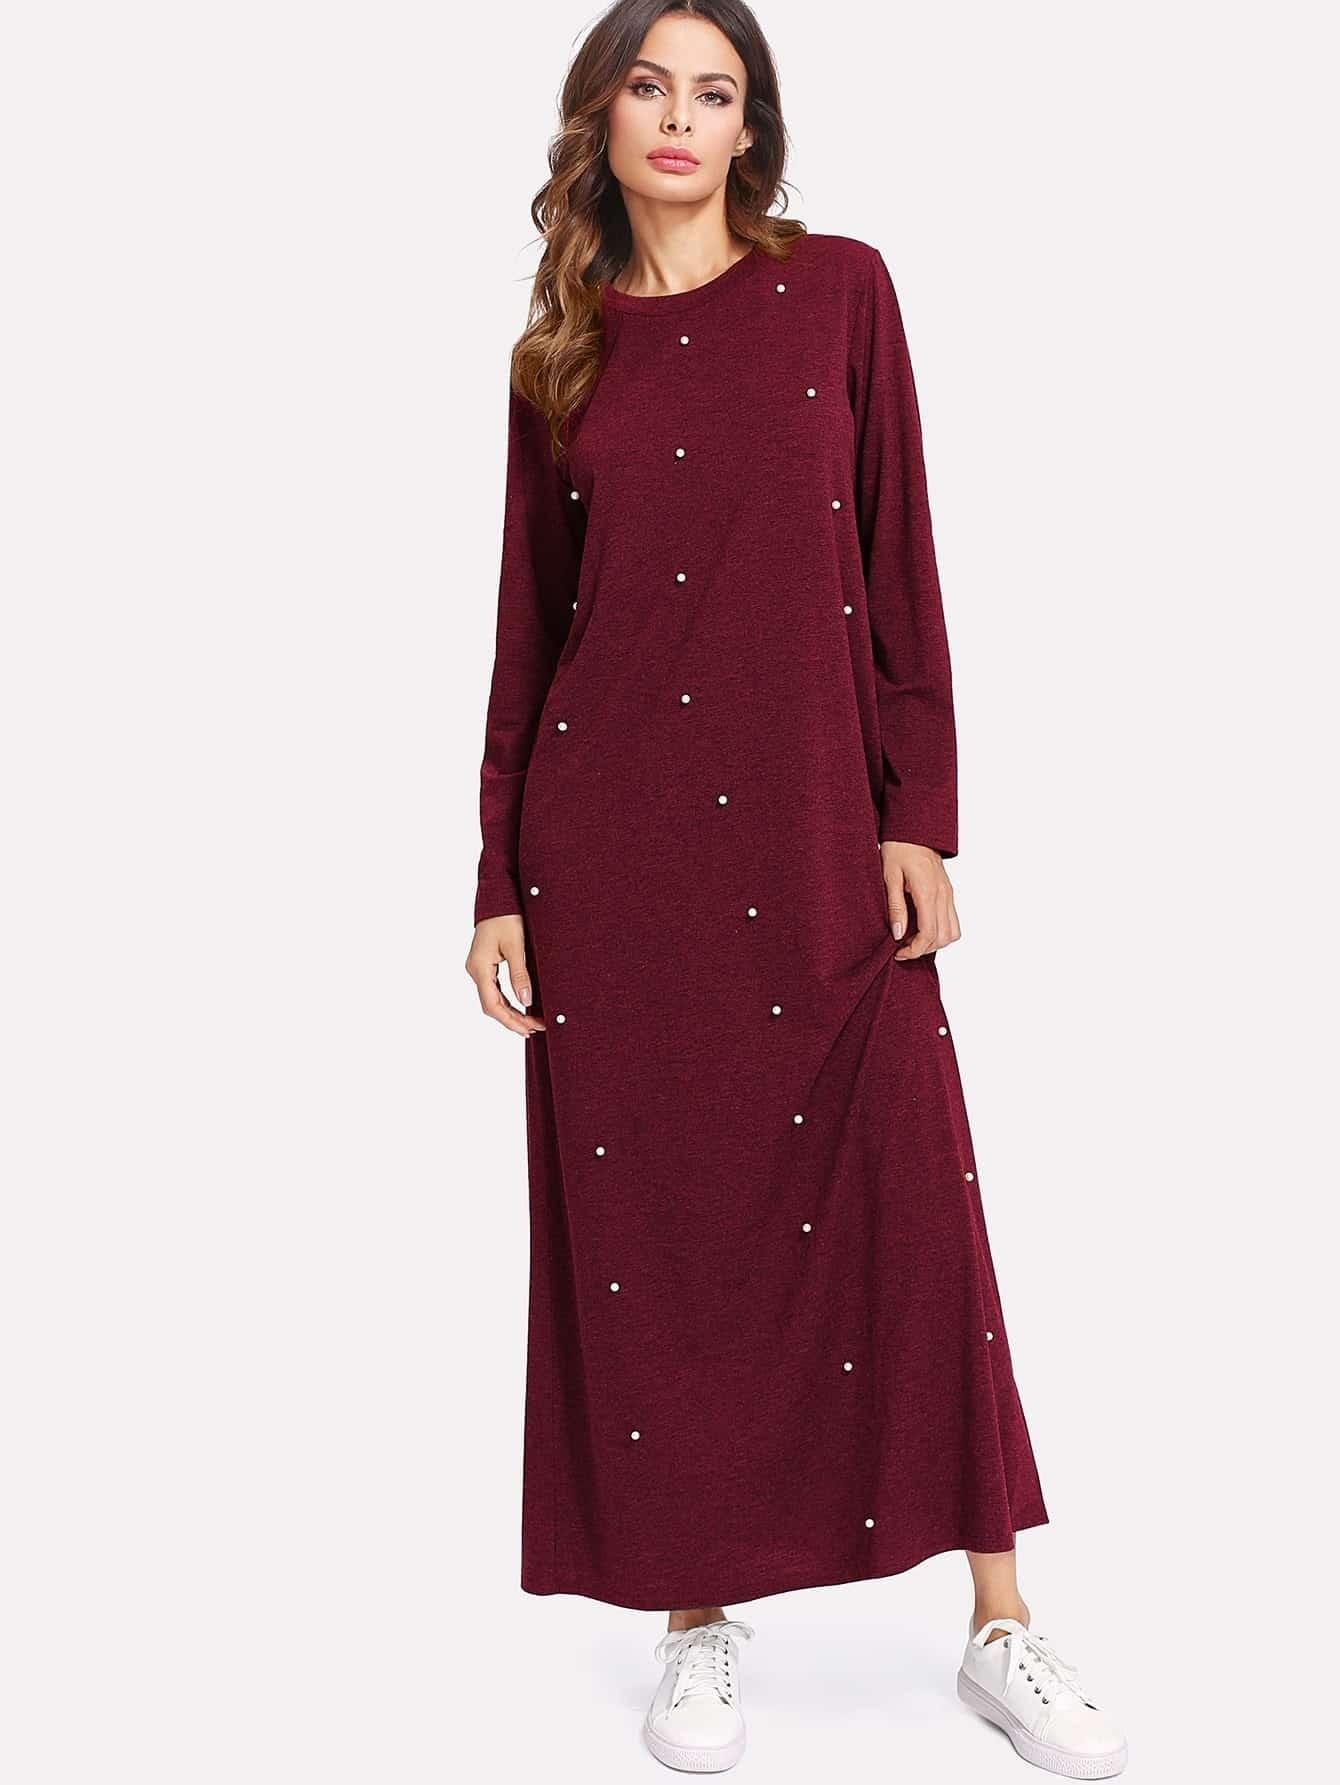 Pearl Beading Marled Knit Dress raglan sleeve marled knit dress